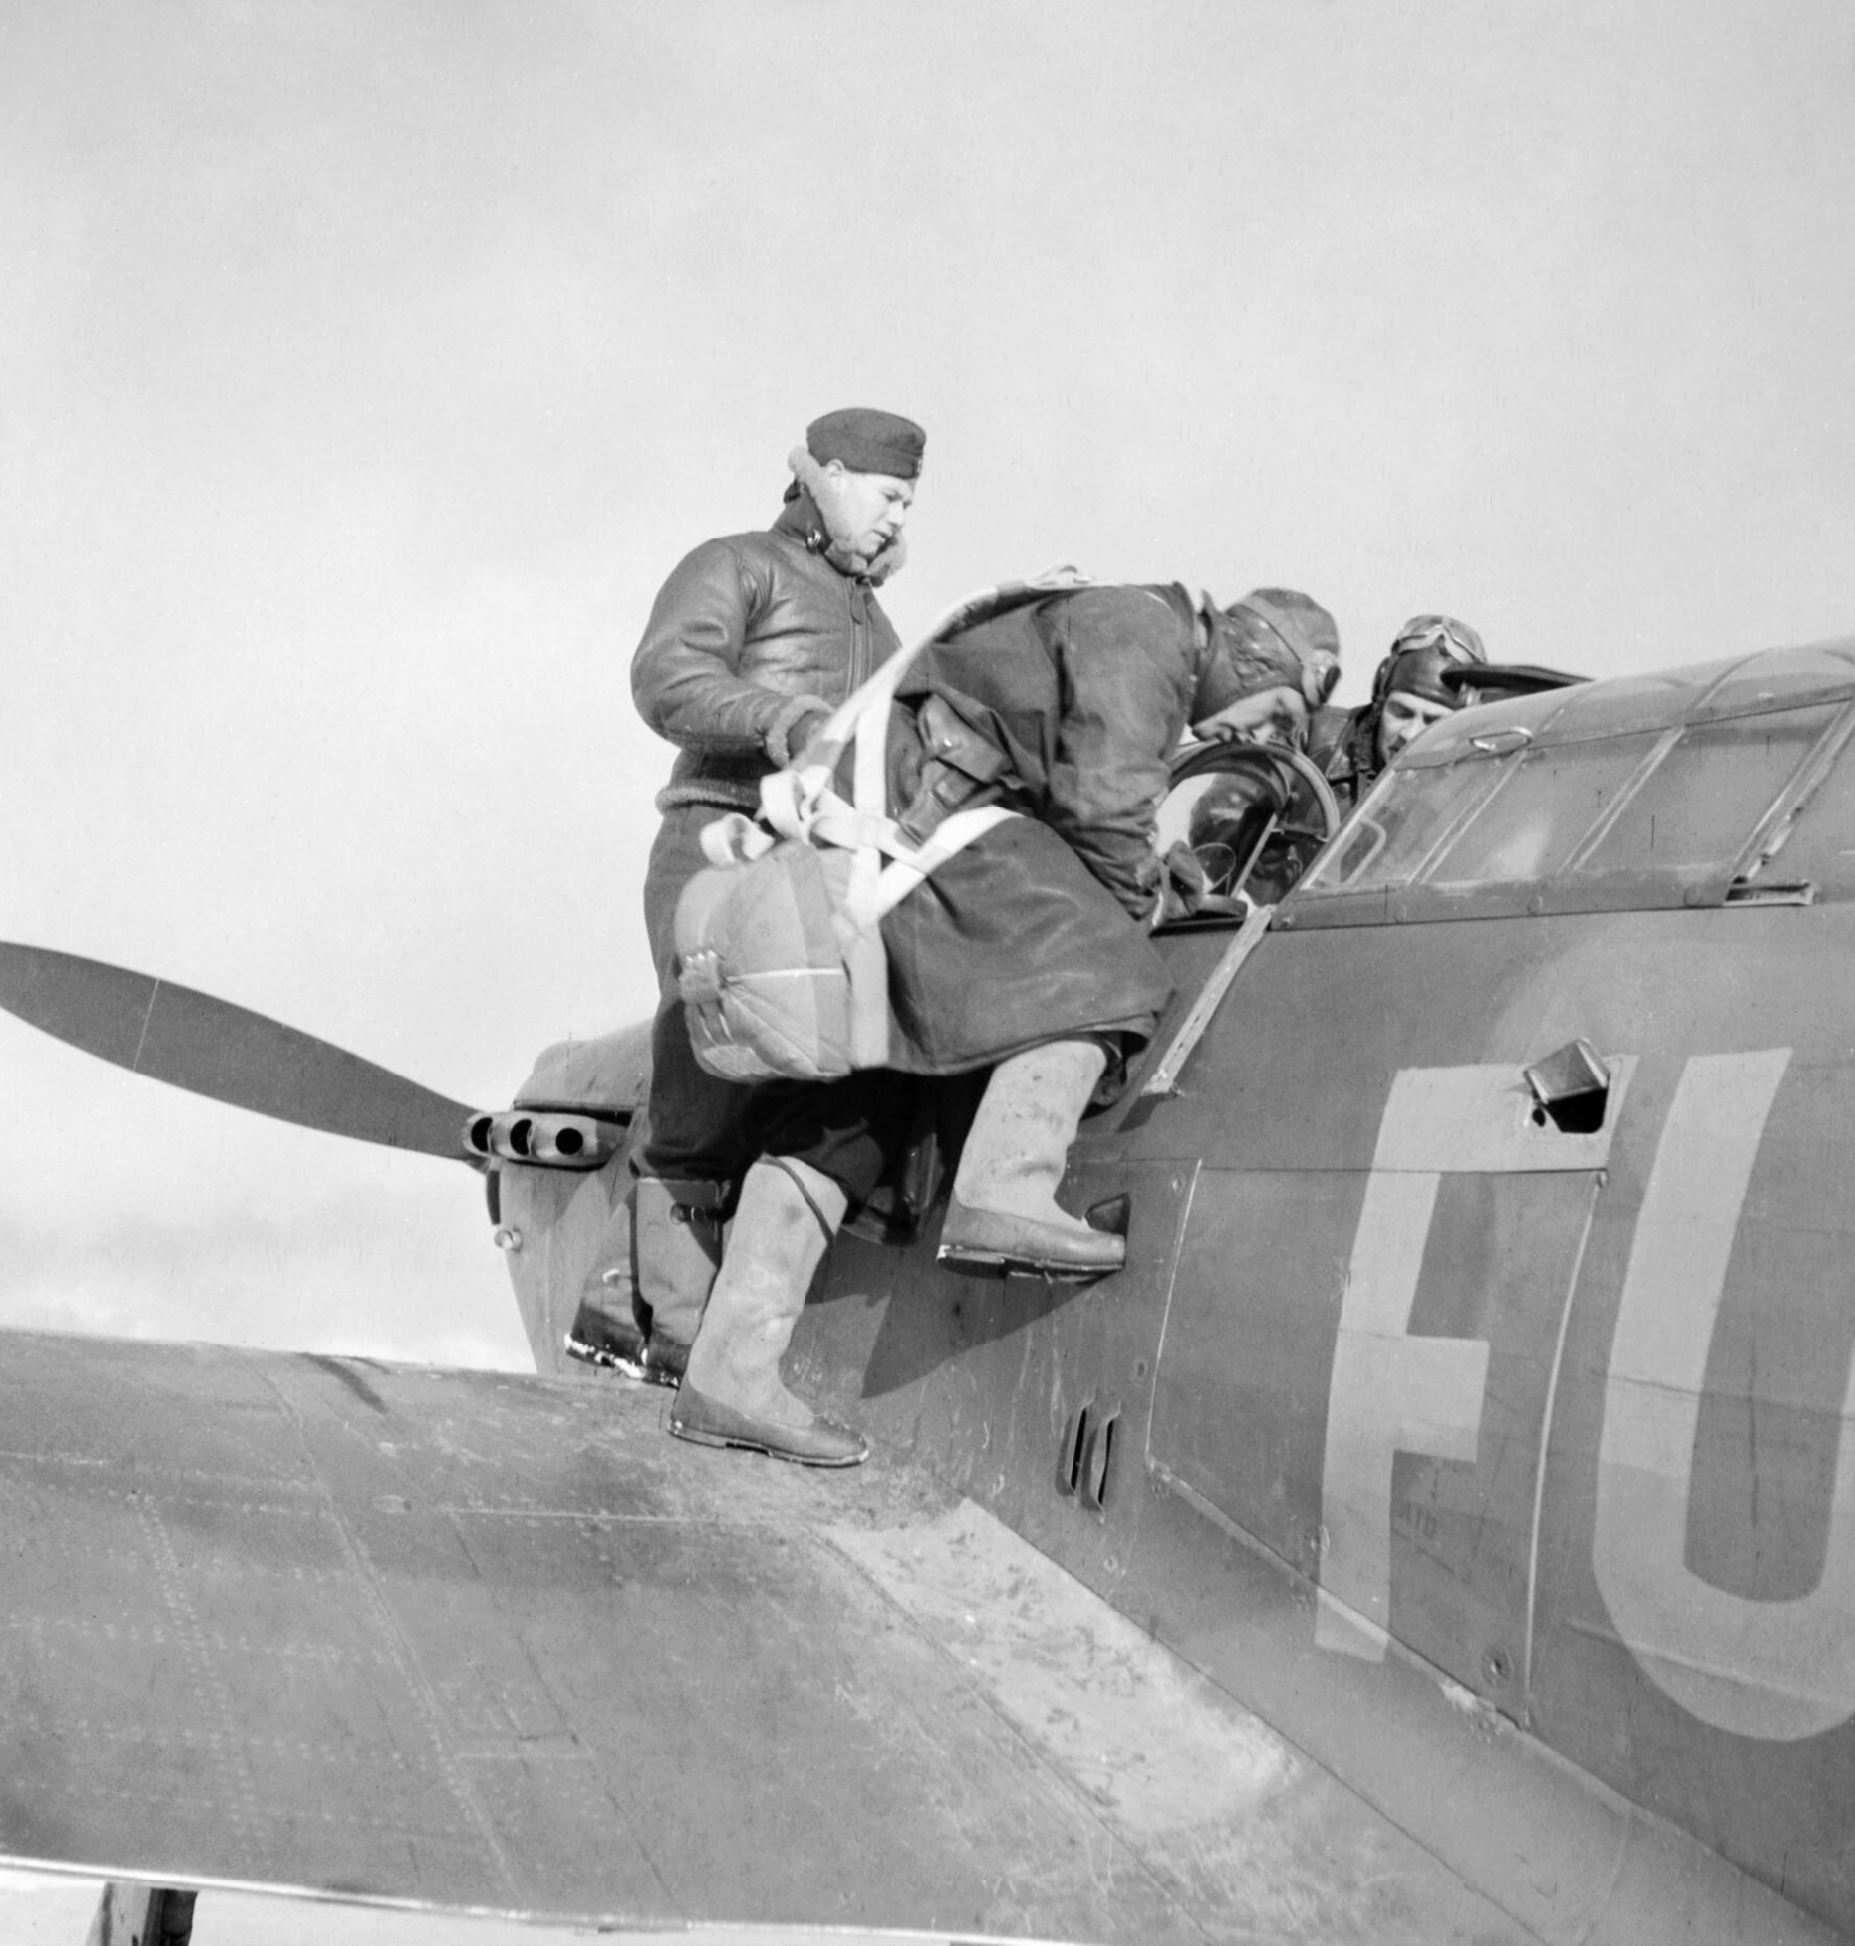 Hurricane IIb Trop RAF 151 Wing 81Sqn FU56 Z4017 Vaenga Oct 1941 IWM CR189